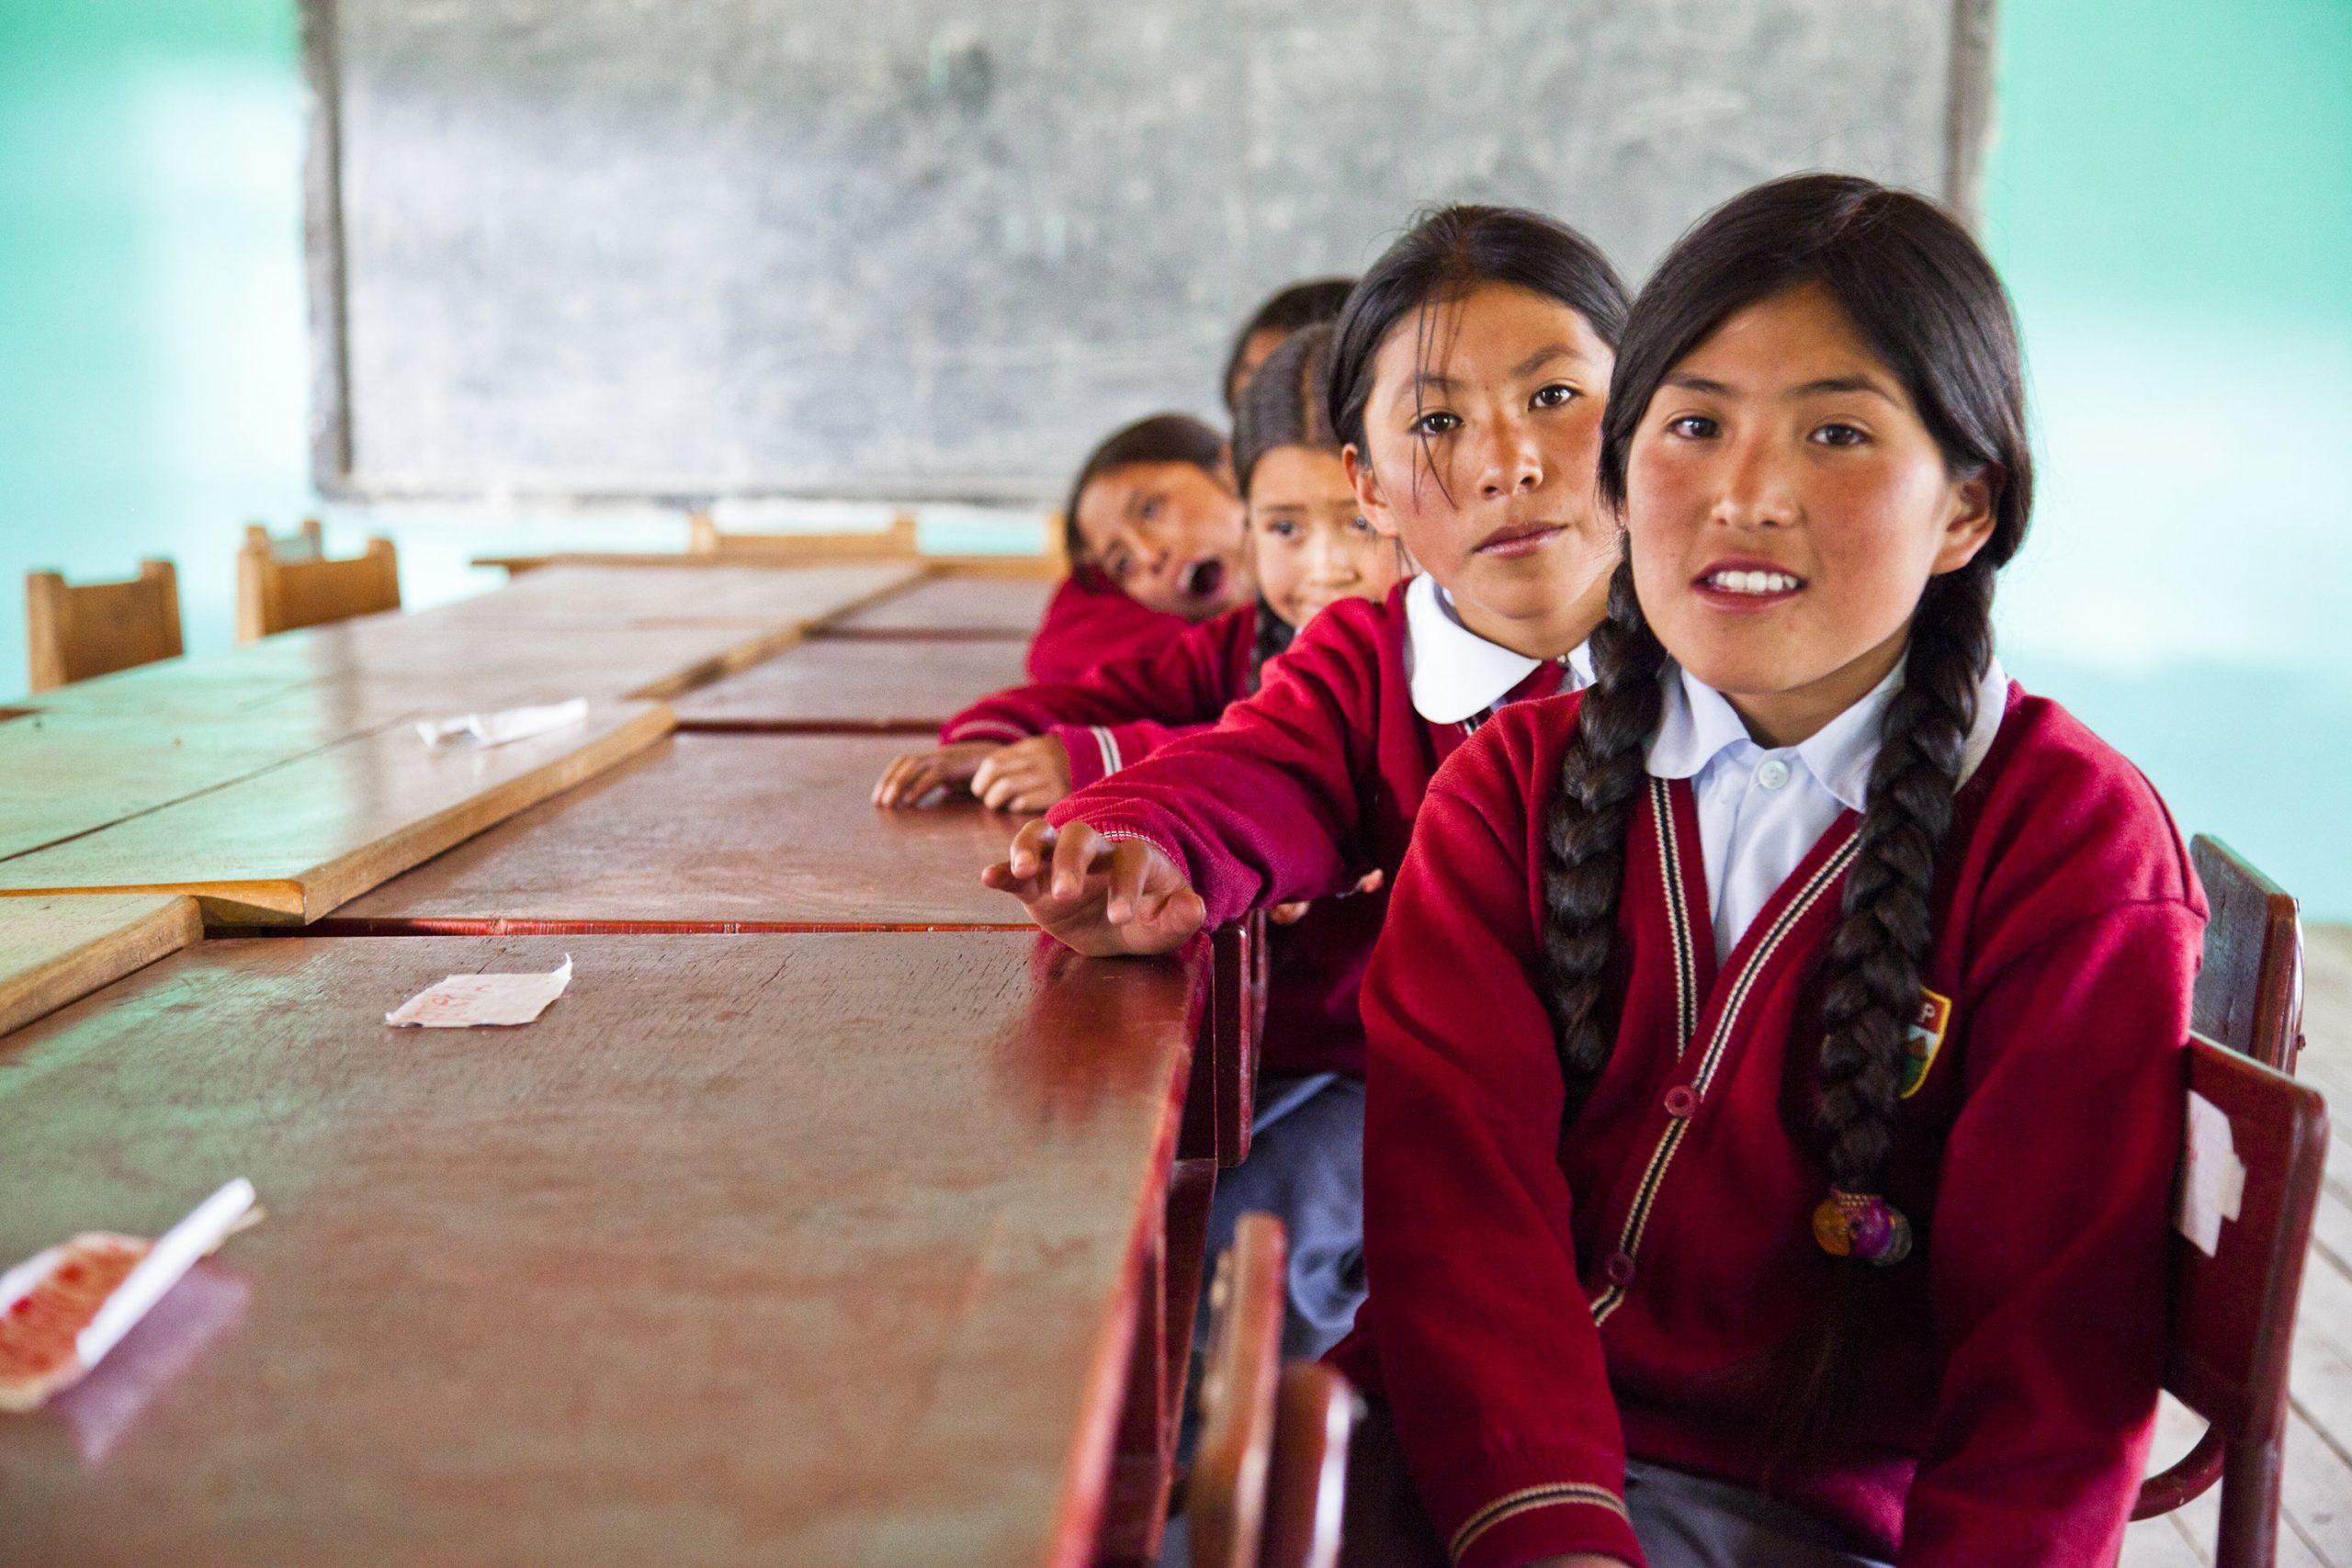 Revolutionizing Education - Empowering The Female Gender